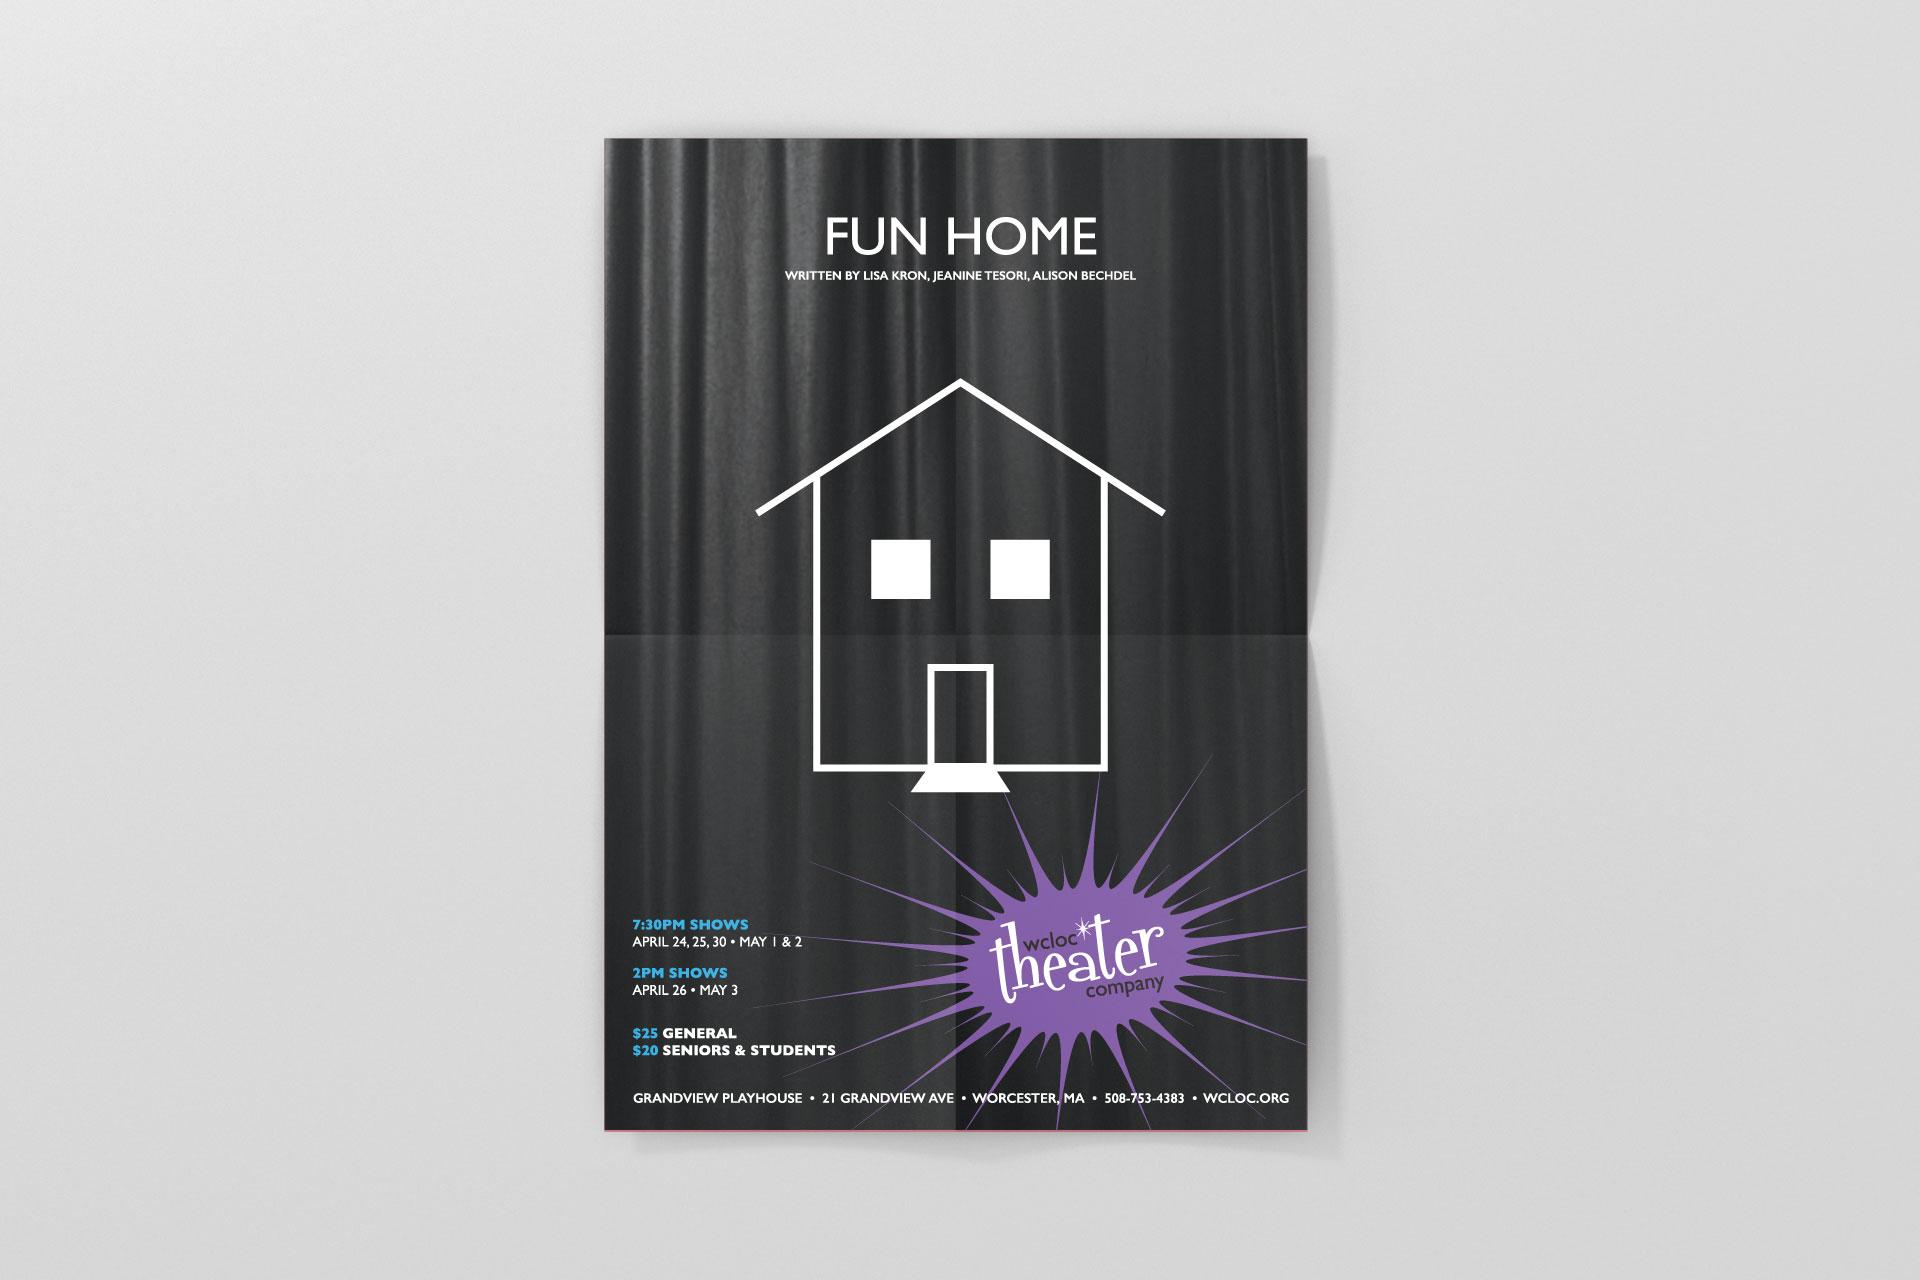 WCLOC Theaterh Poster - Fun Home